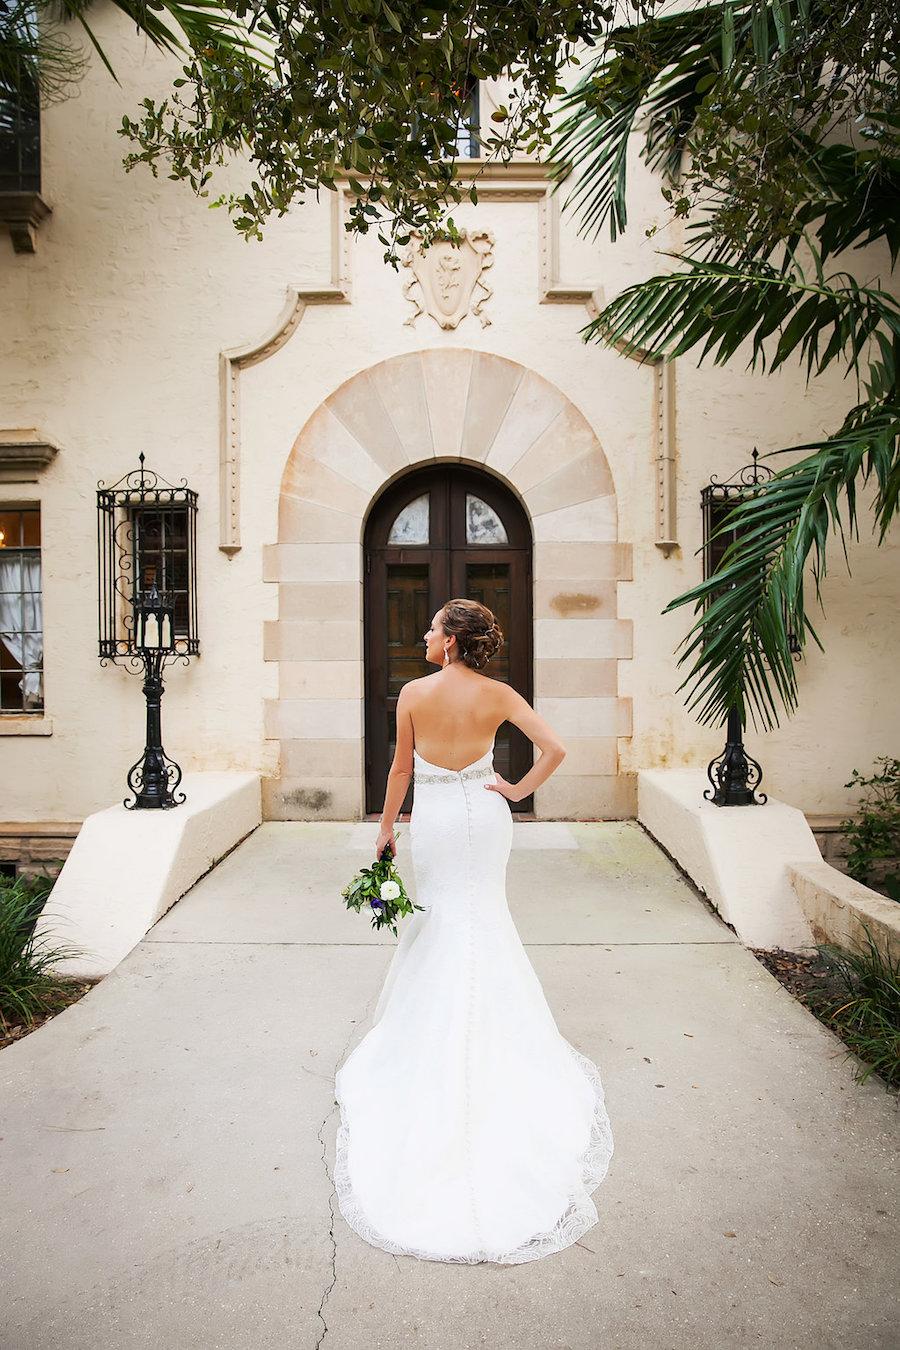 Bride Portrait with Ivory Anna Maier Strapless Wedding Dress   Tampa Bay Wedding Photographer Limelight Photography   Powel Crosley Estate